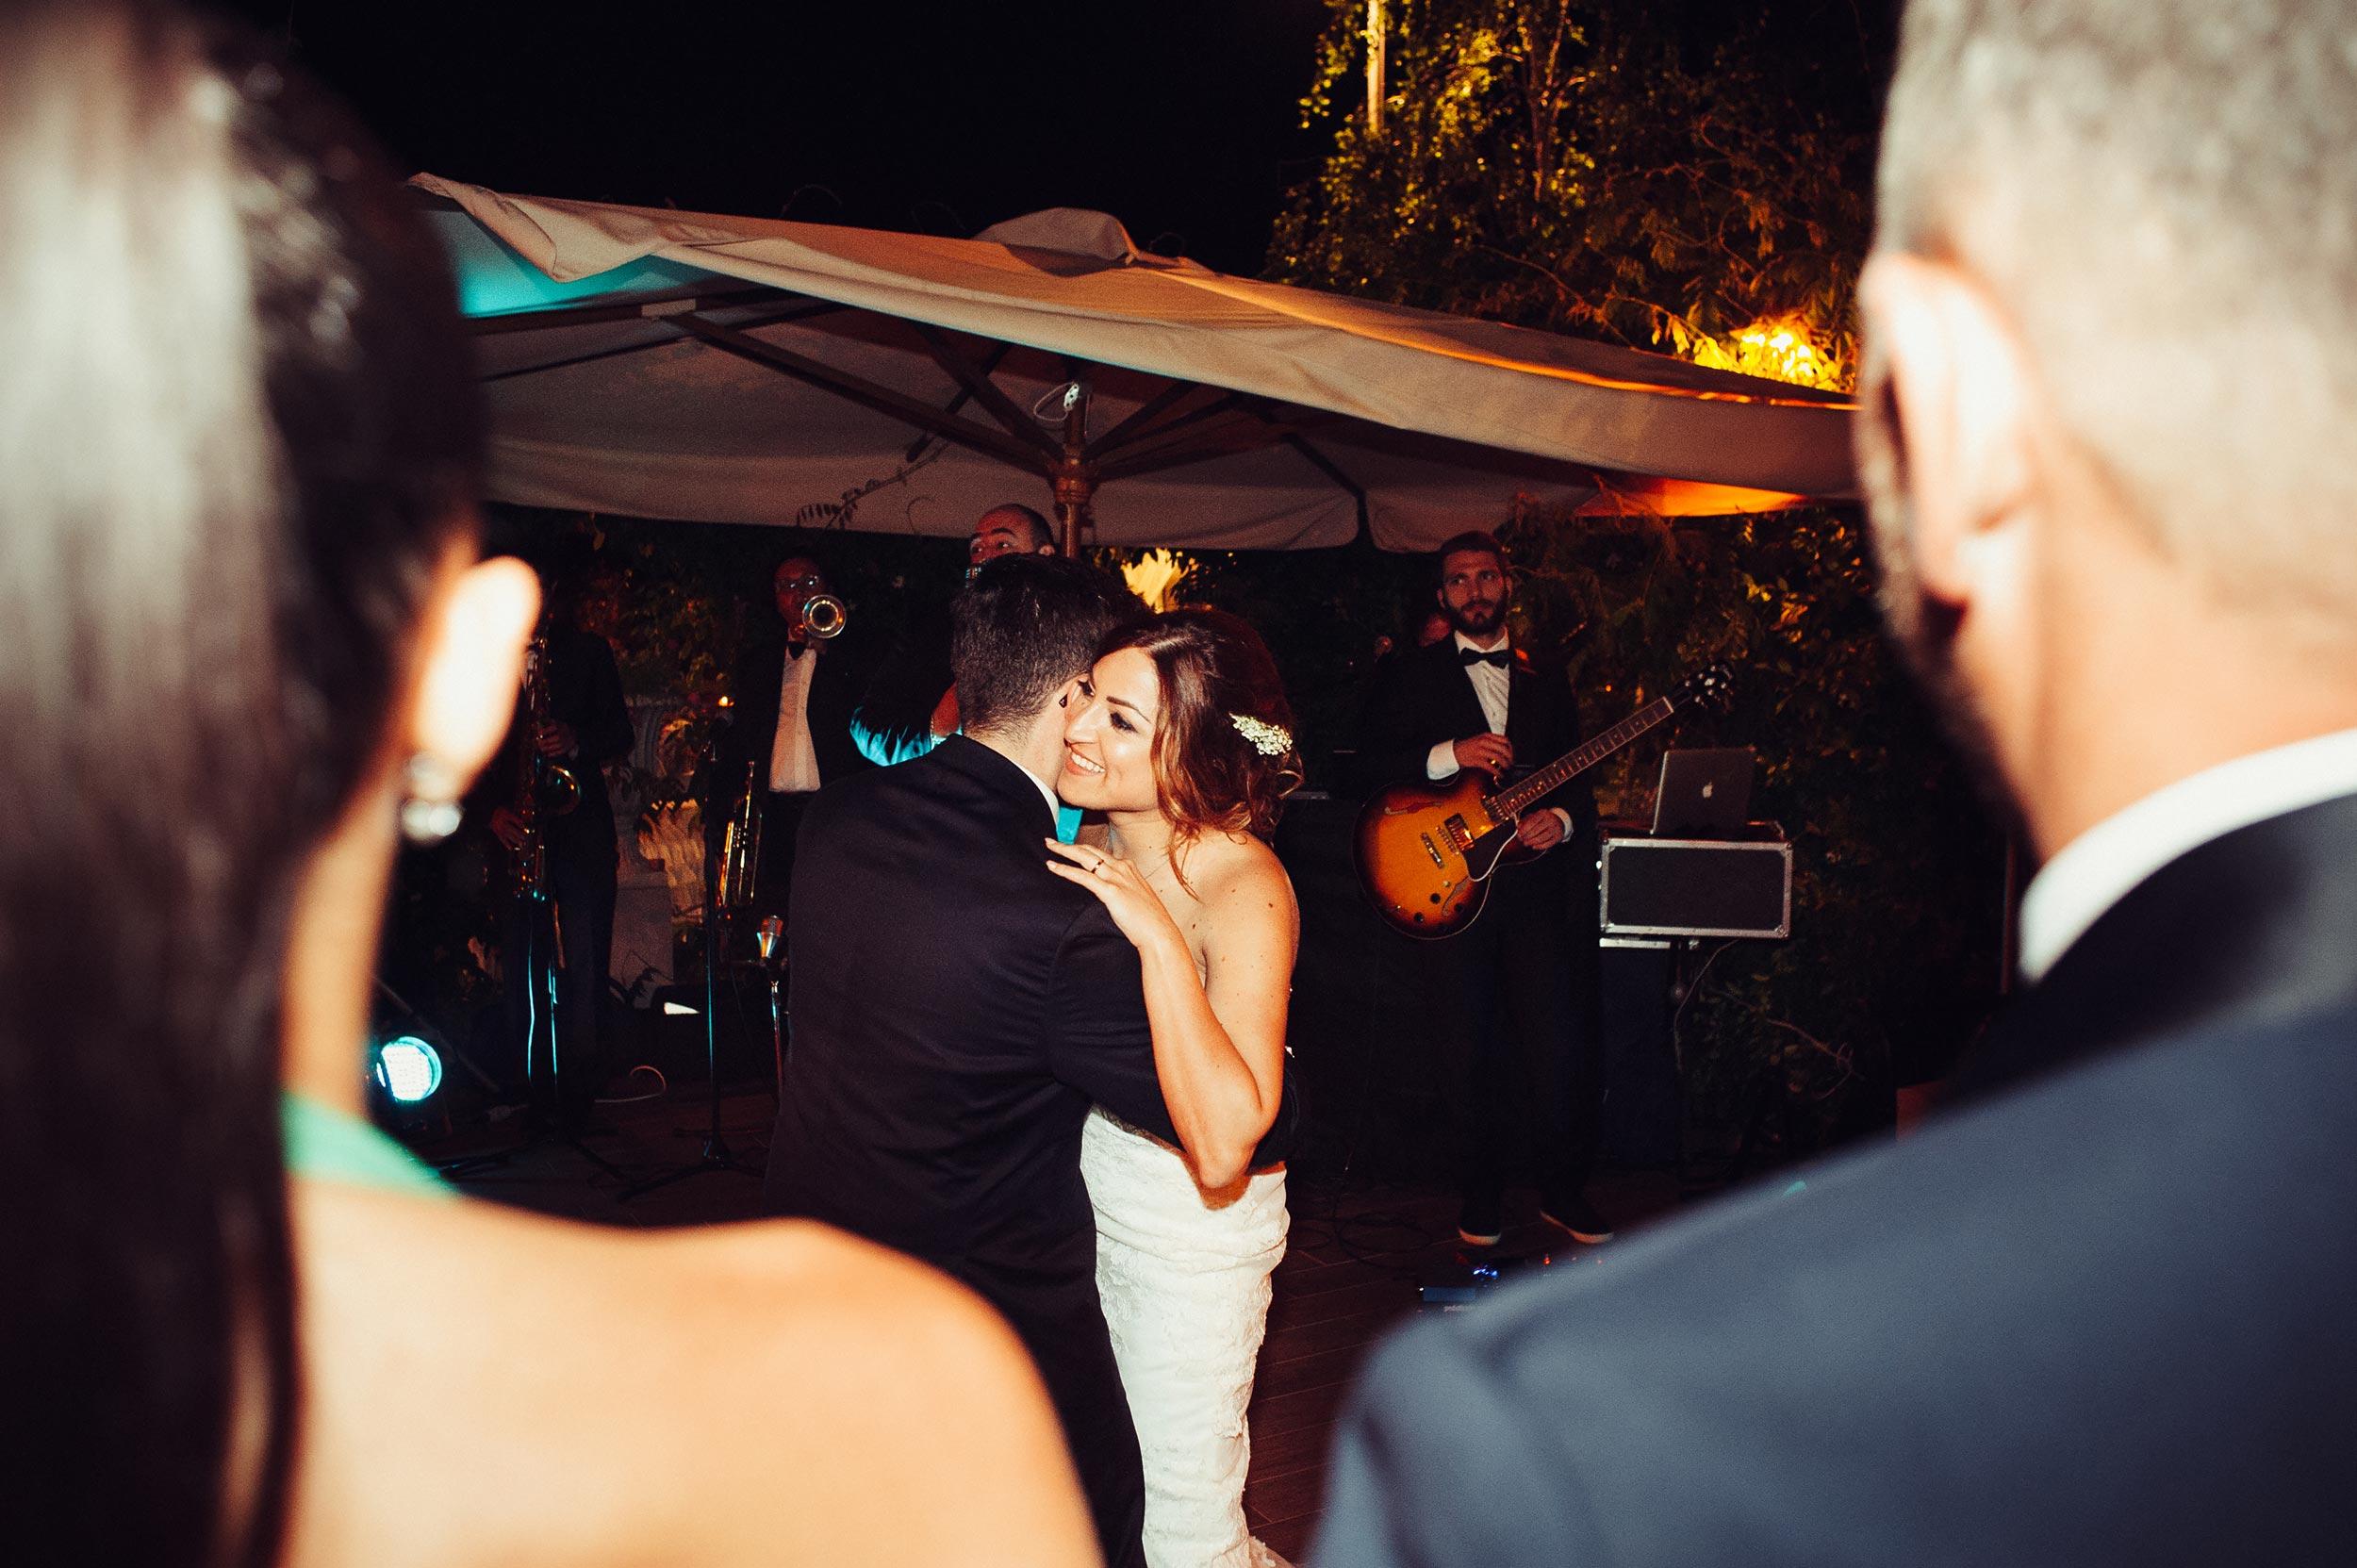 2016-Claudio-Teresa-Naples-Wedding-Photographer-Italy-Alessandro-Avenali-92.jpg